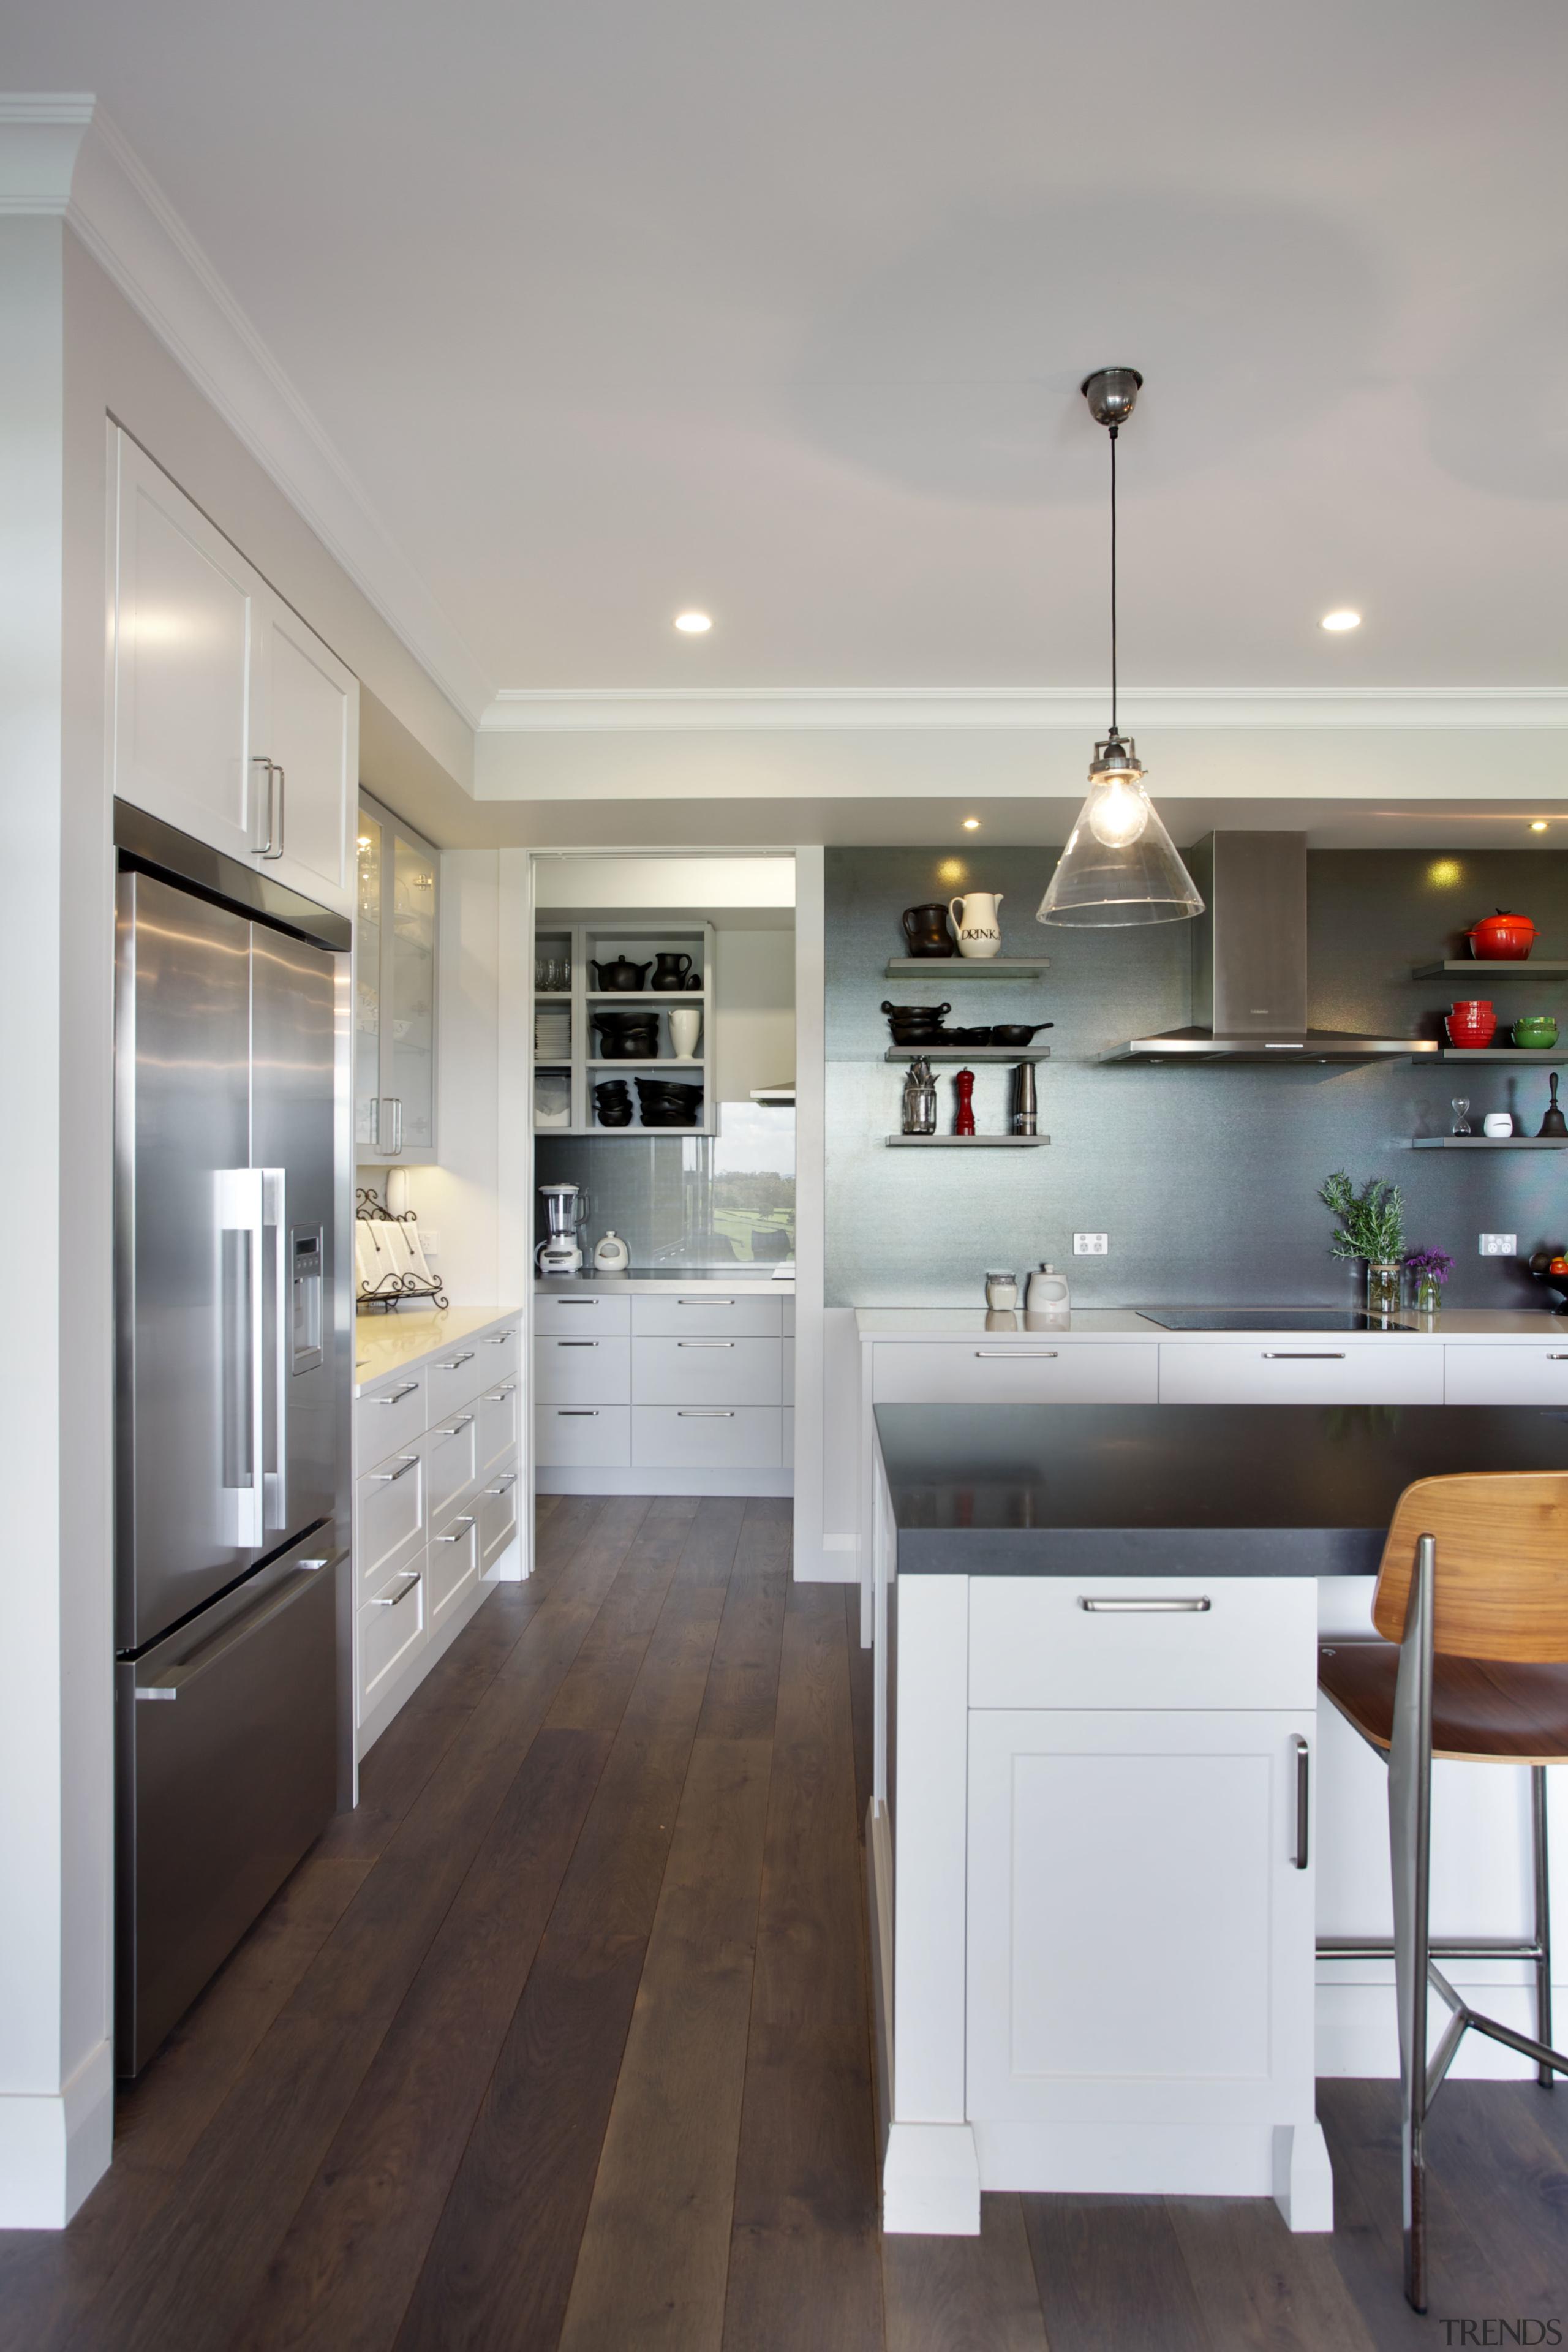 The open door to the scullery shows that cabinetry, countertop, cuisine classique, floor, flooring, home appliance, interior design, kitchen, room, wood flooring, gray